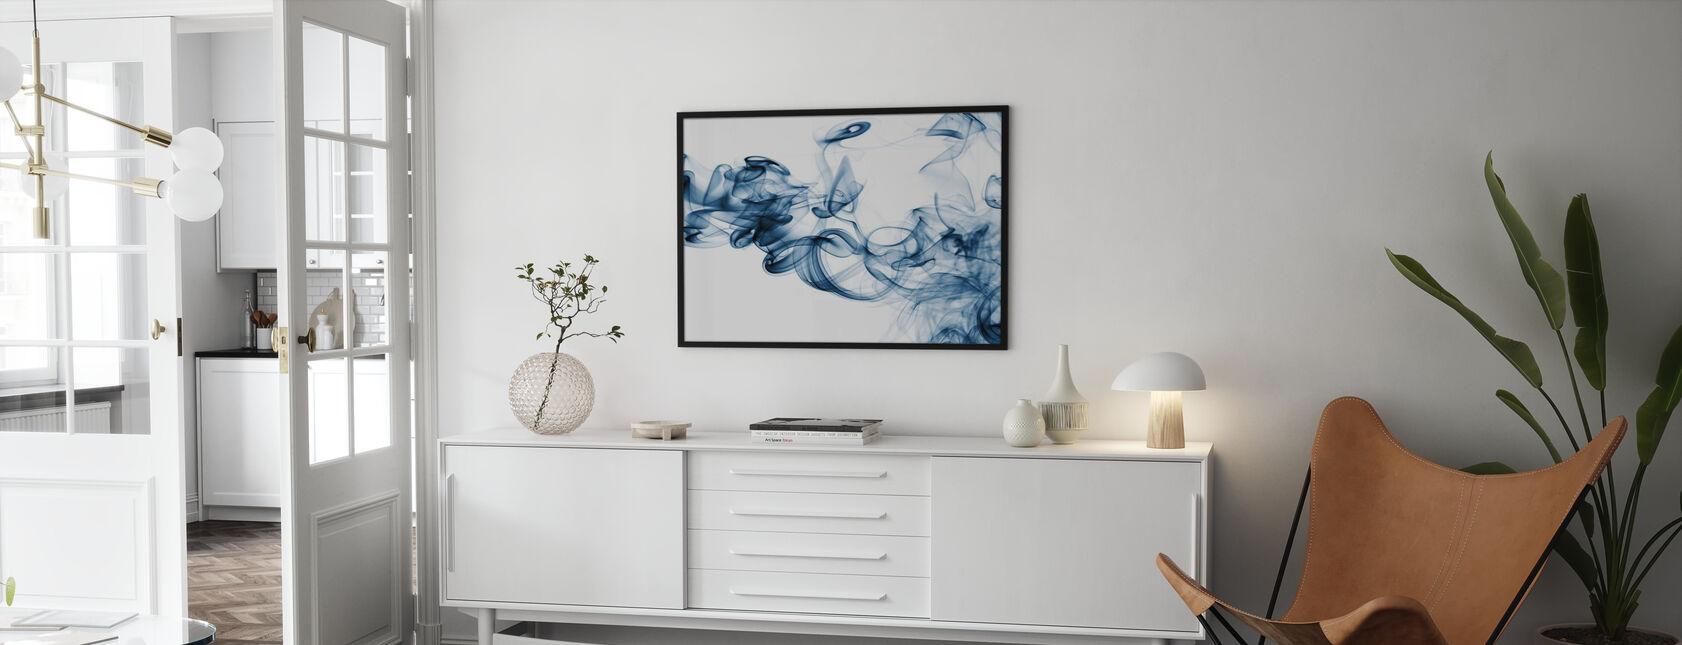 Streams of Smoke - Poster - Living Room